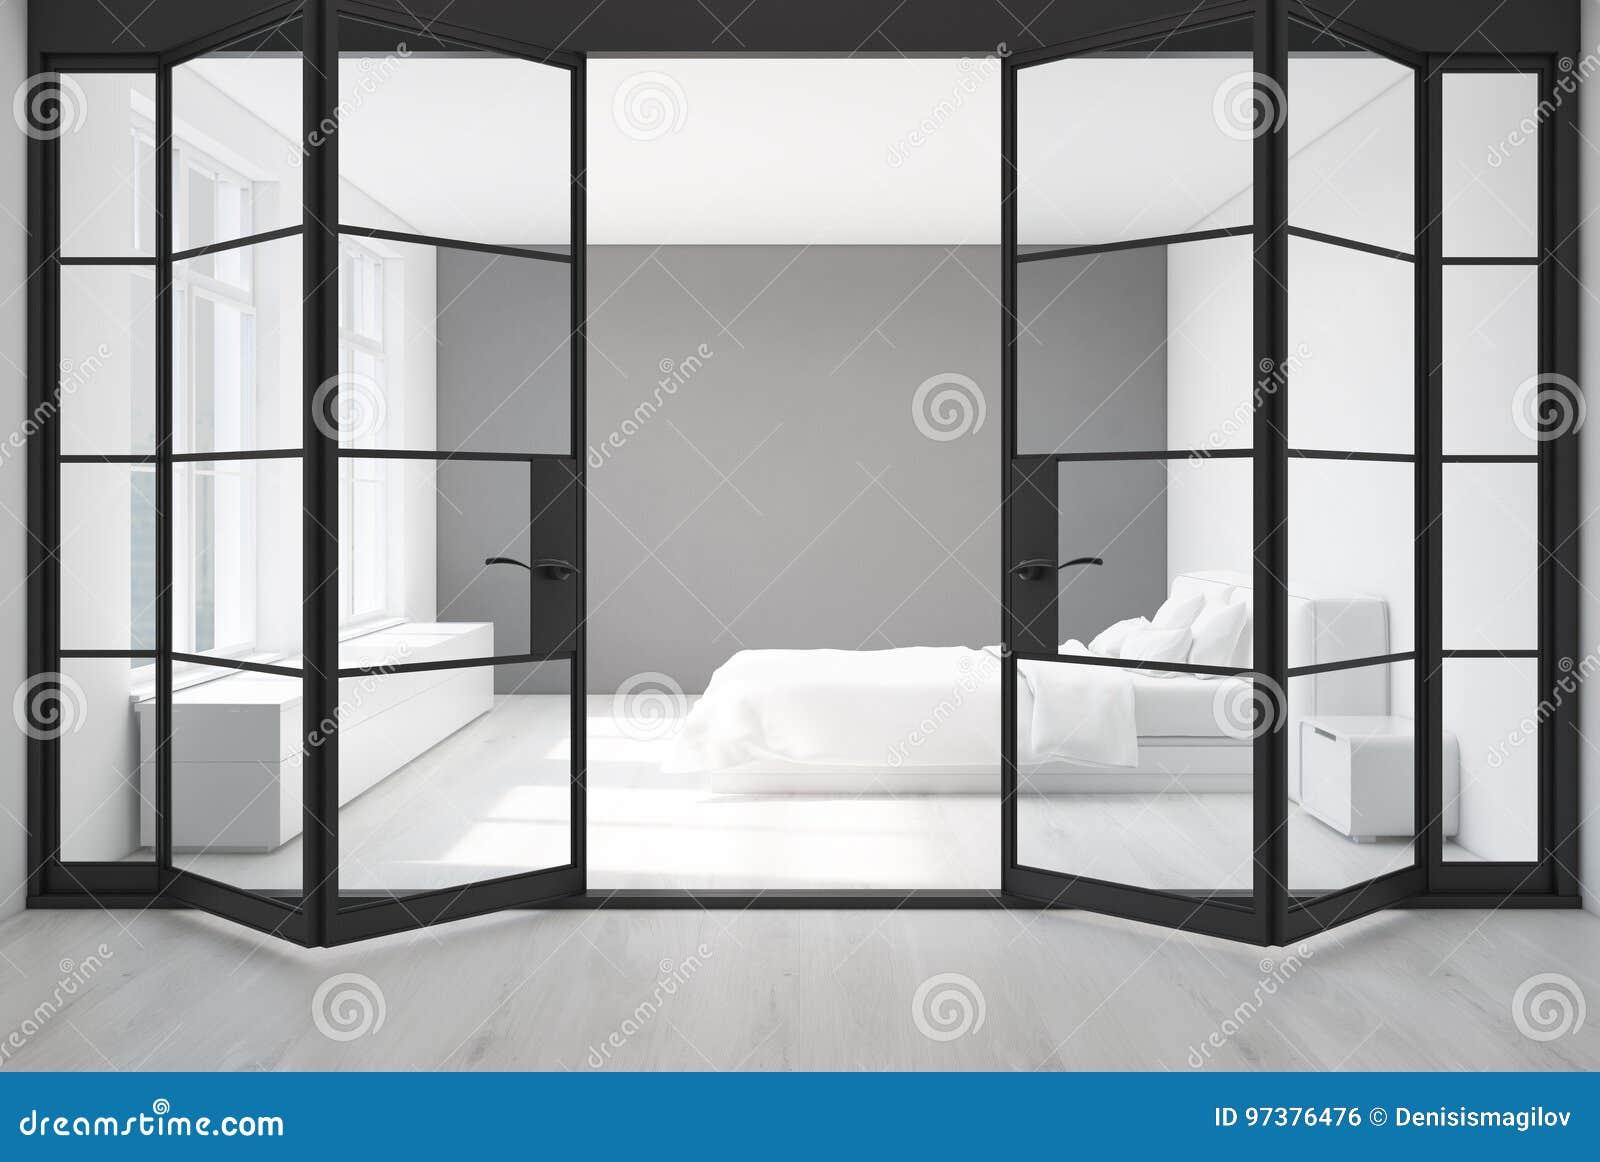 Weißes Schlafzimmer, Graue Wand, Türen Stock Abbildung ...